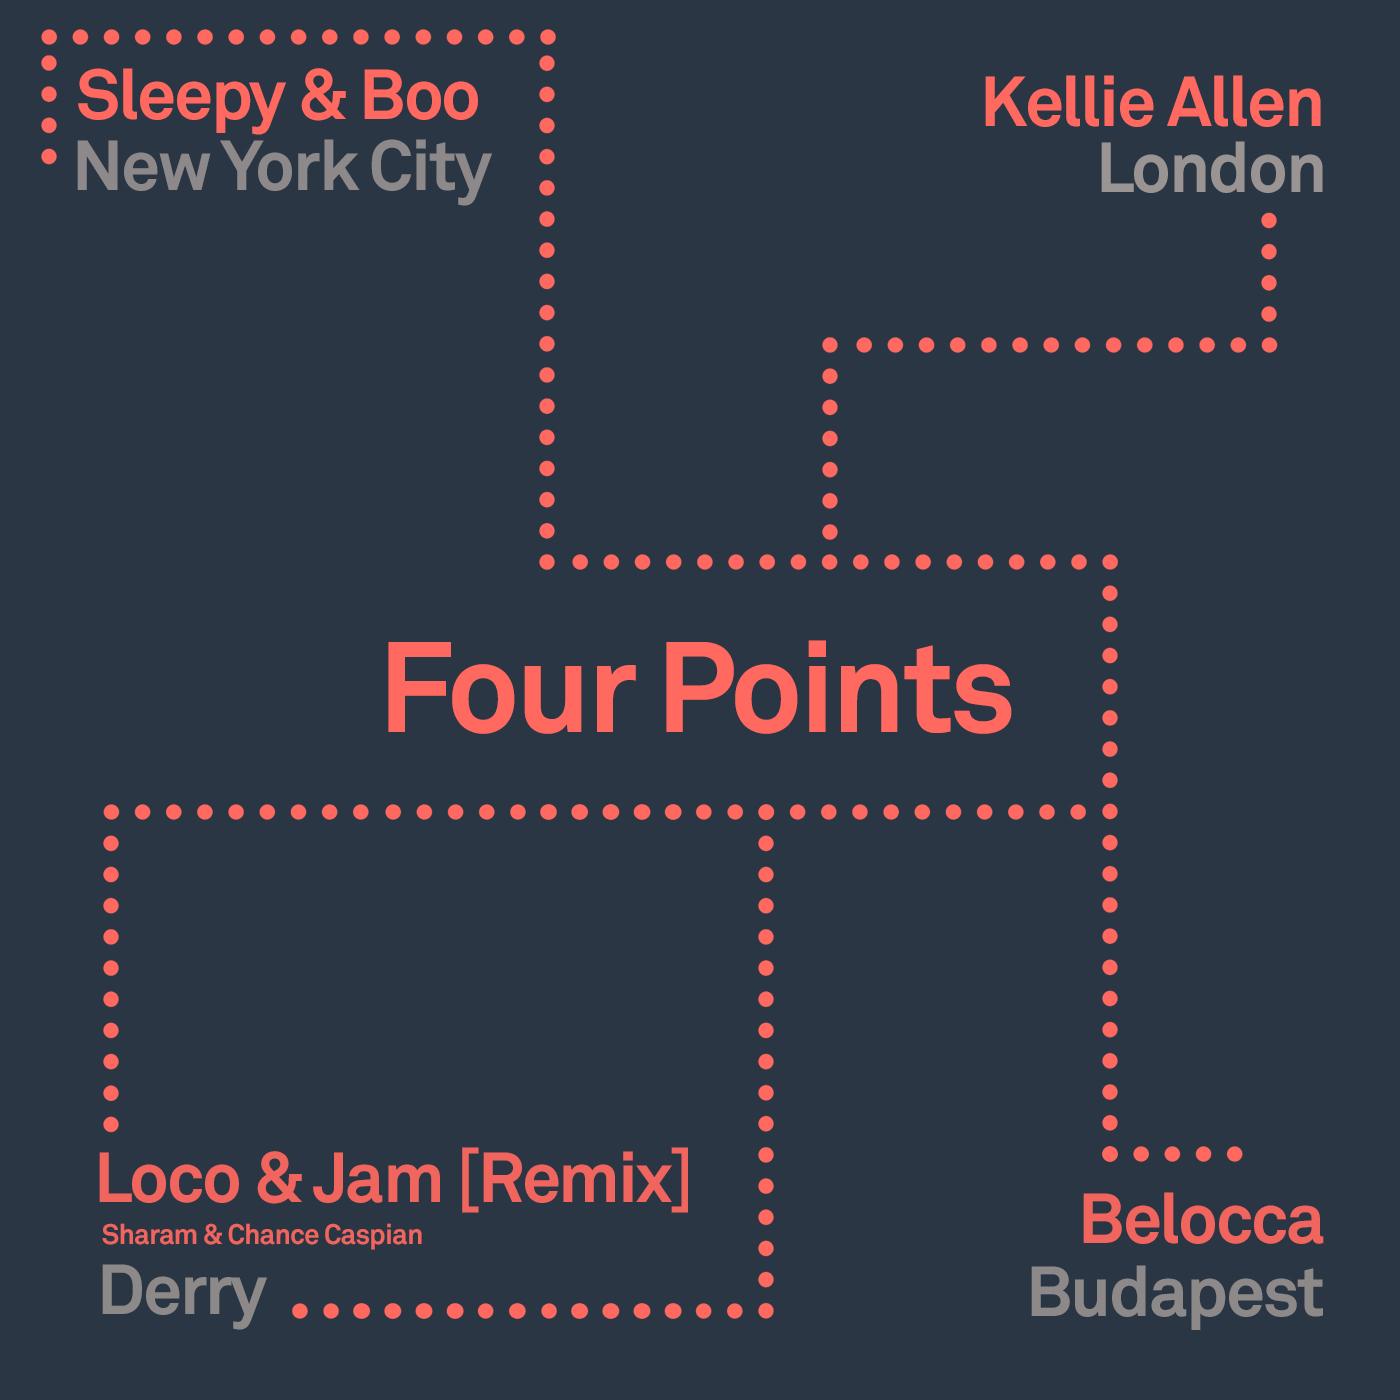 Four Points Art.jpg